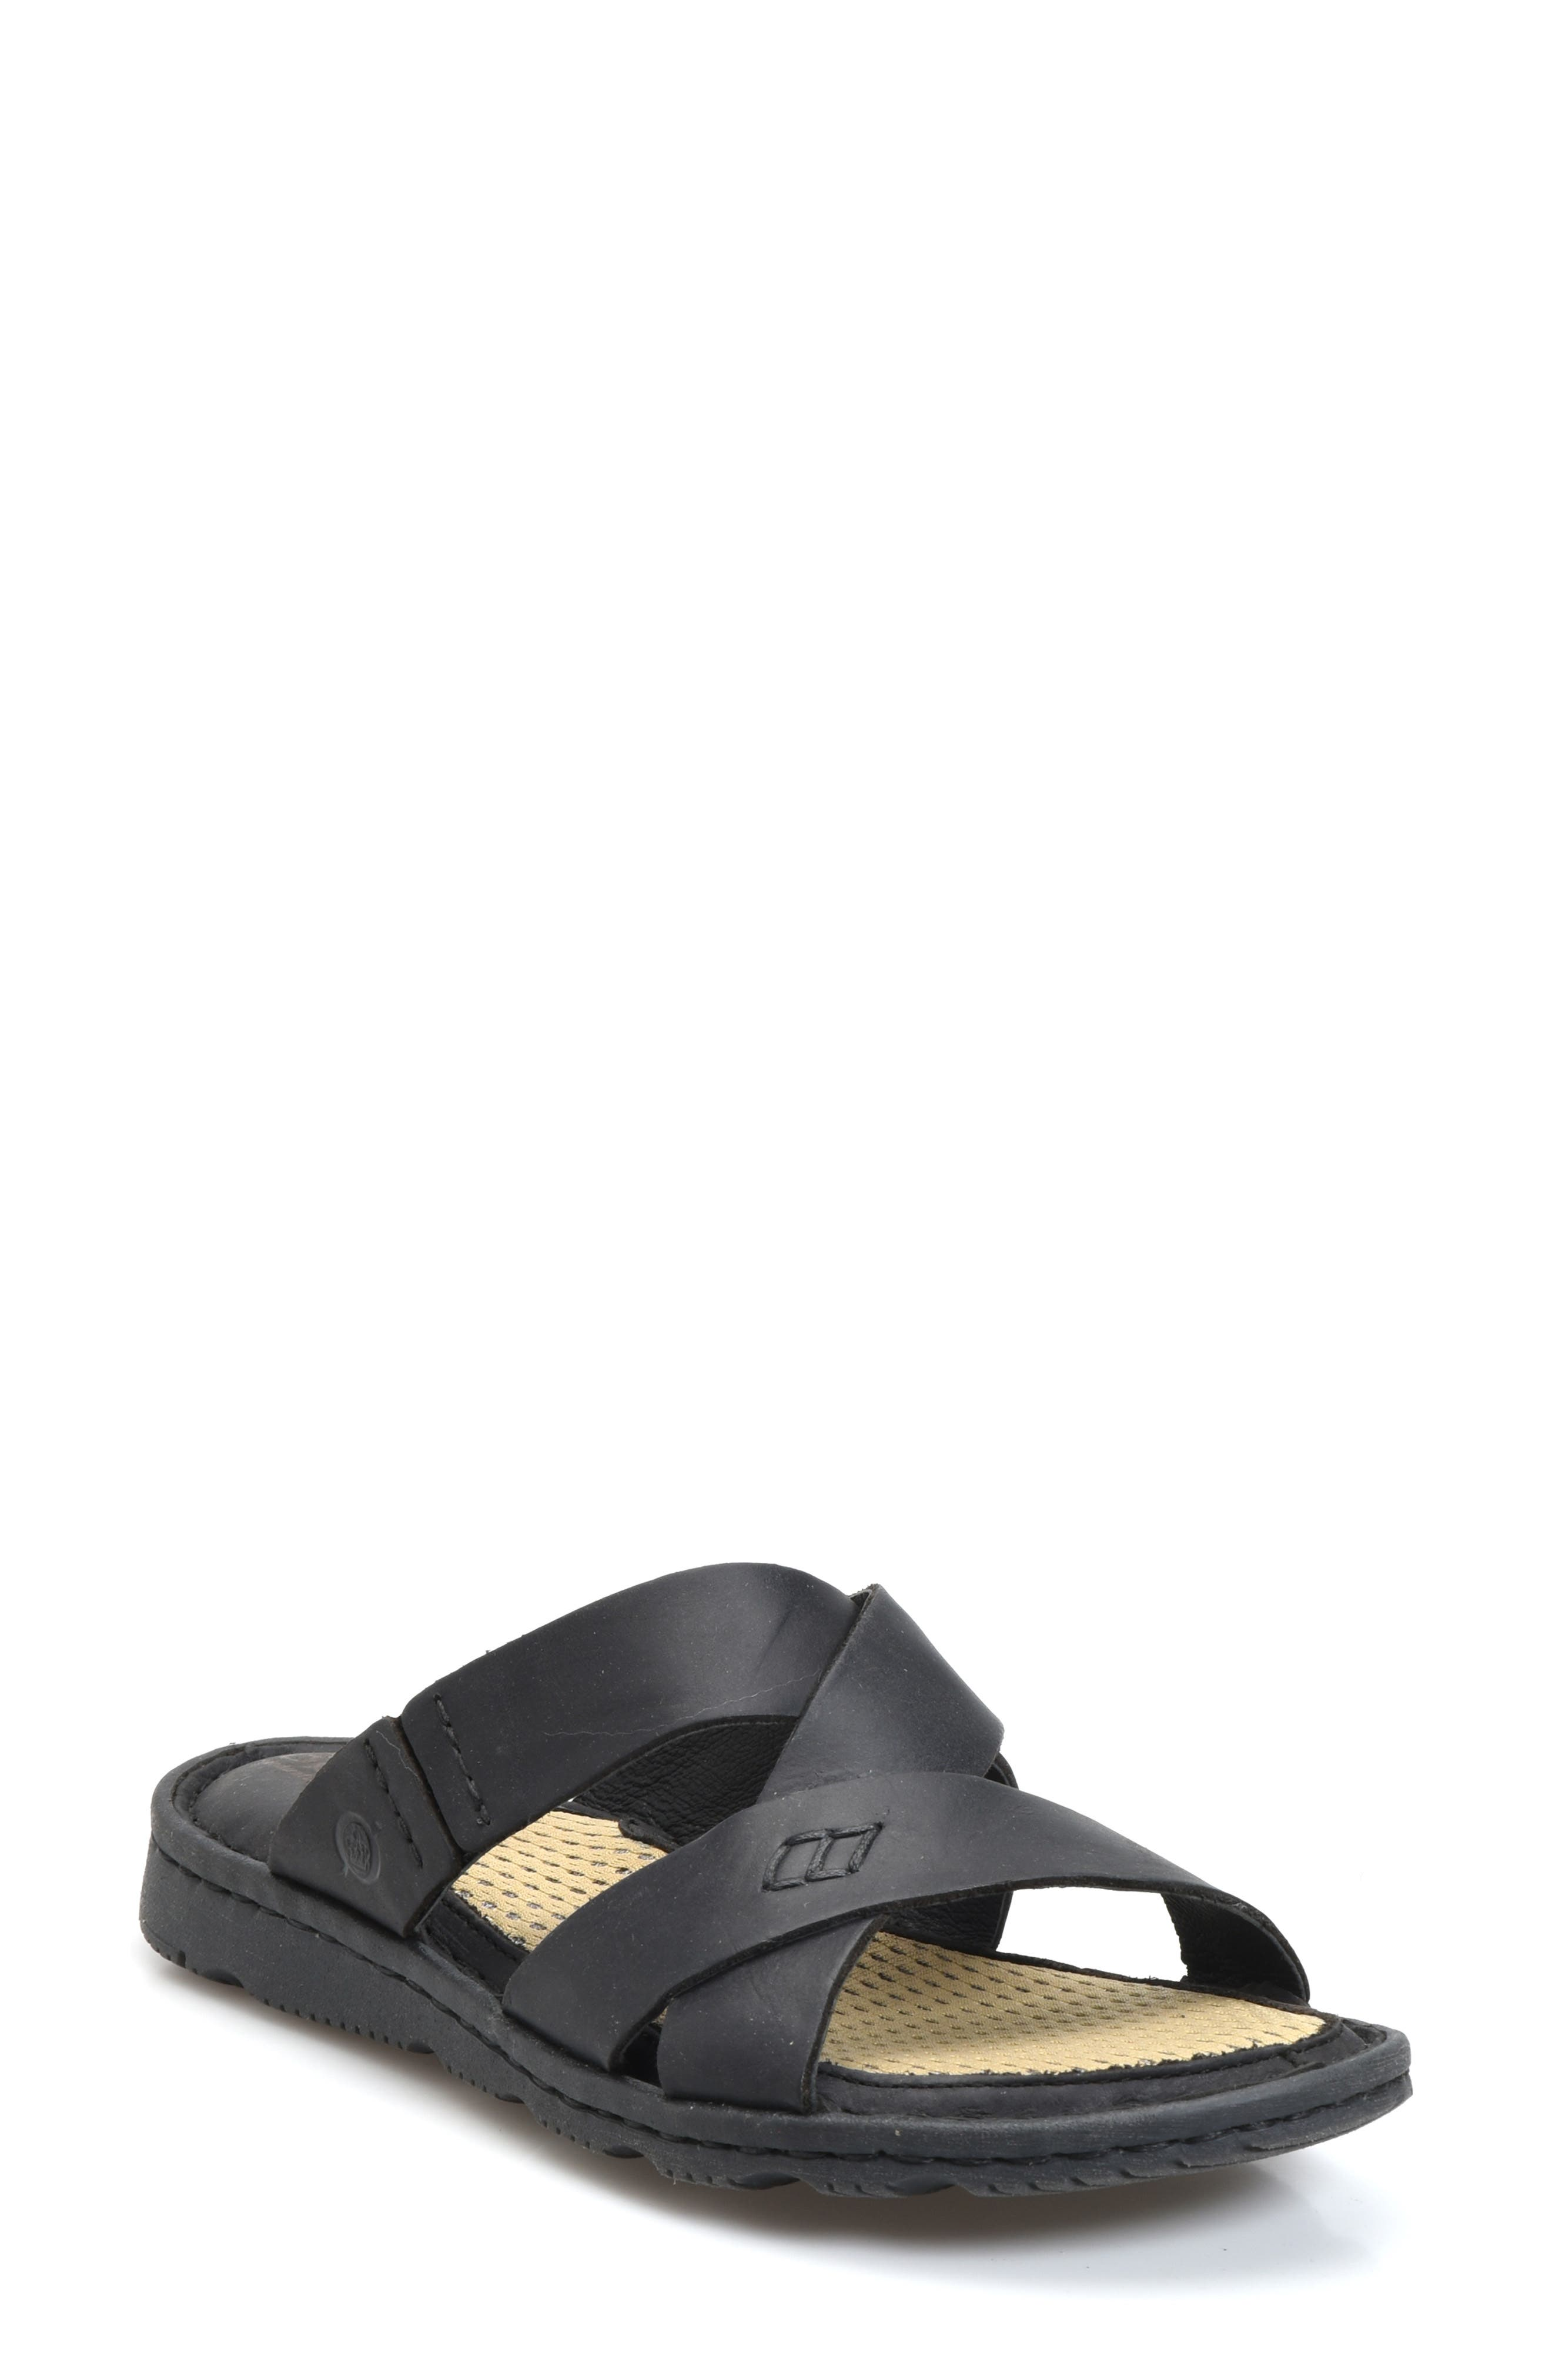 B?rn Hayka Asymmetrical Slide Sandal, Black